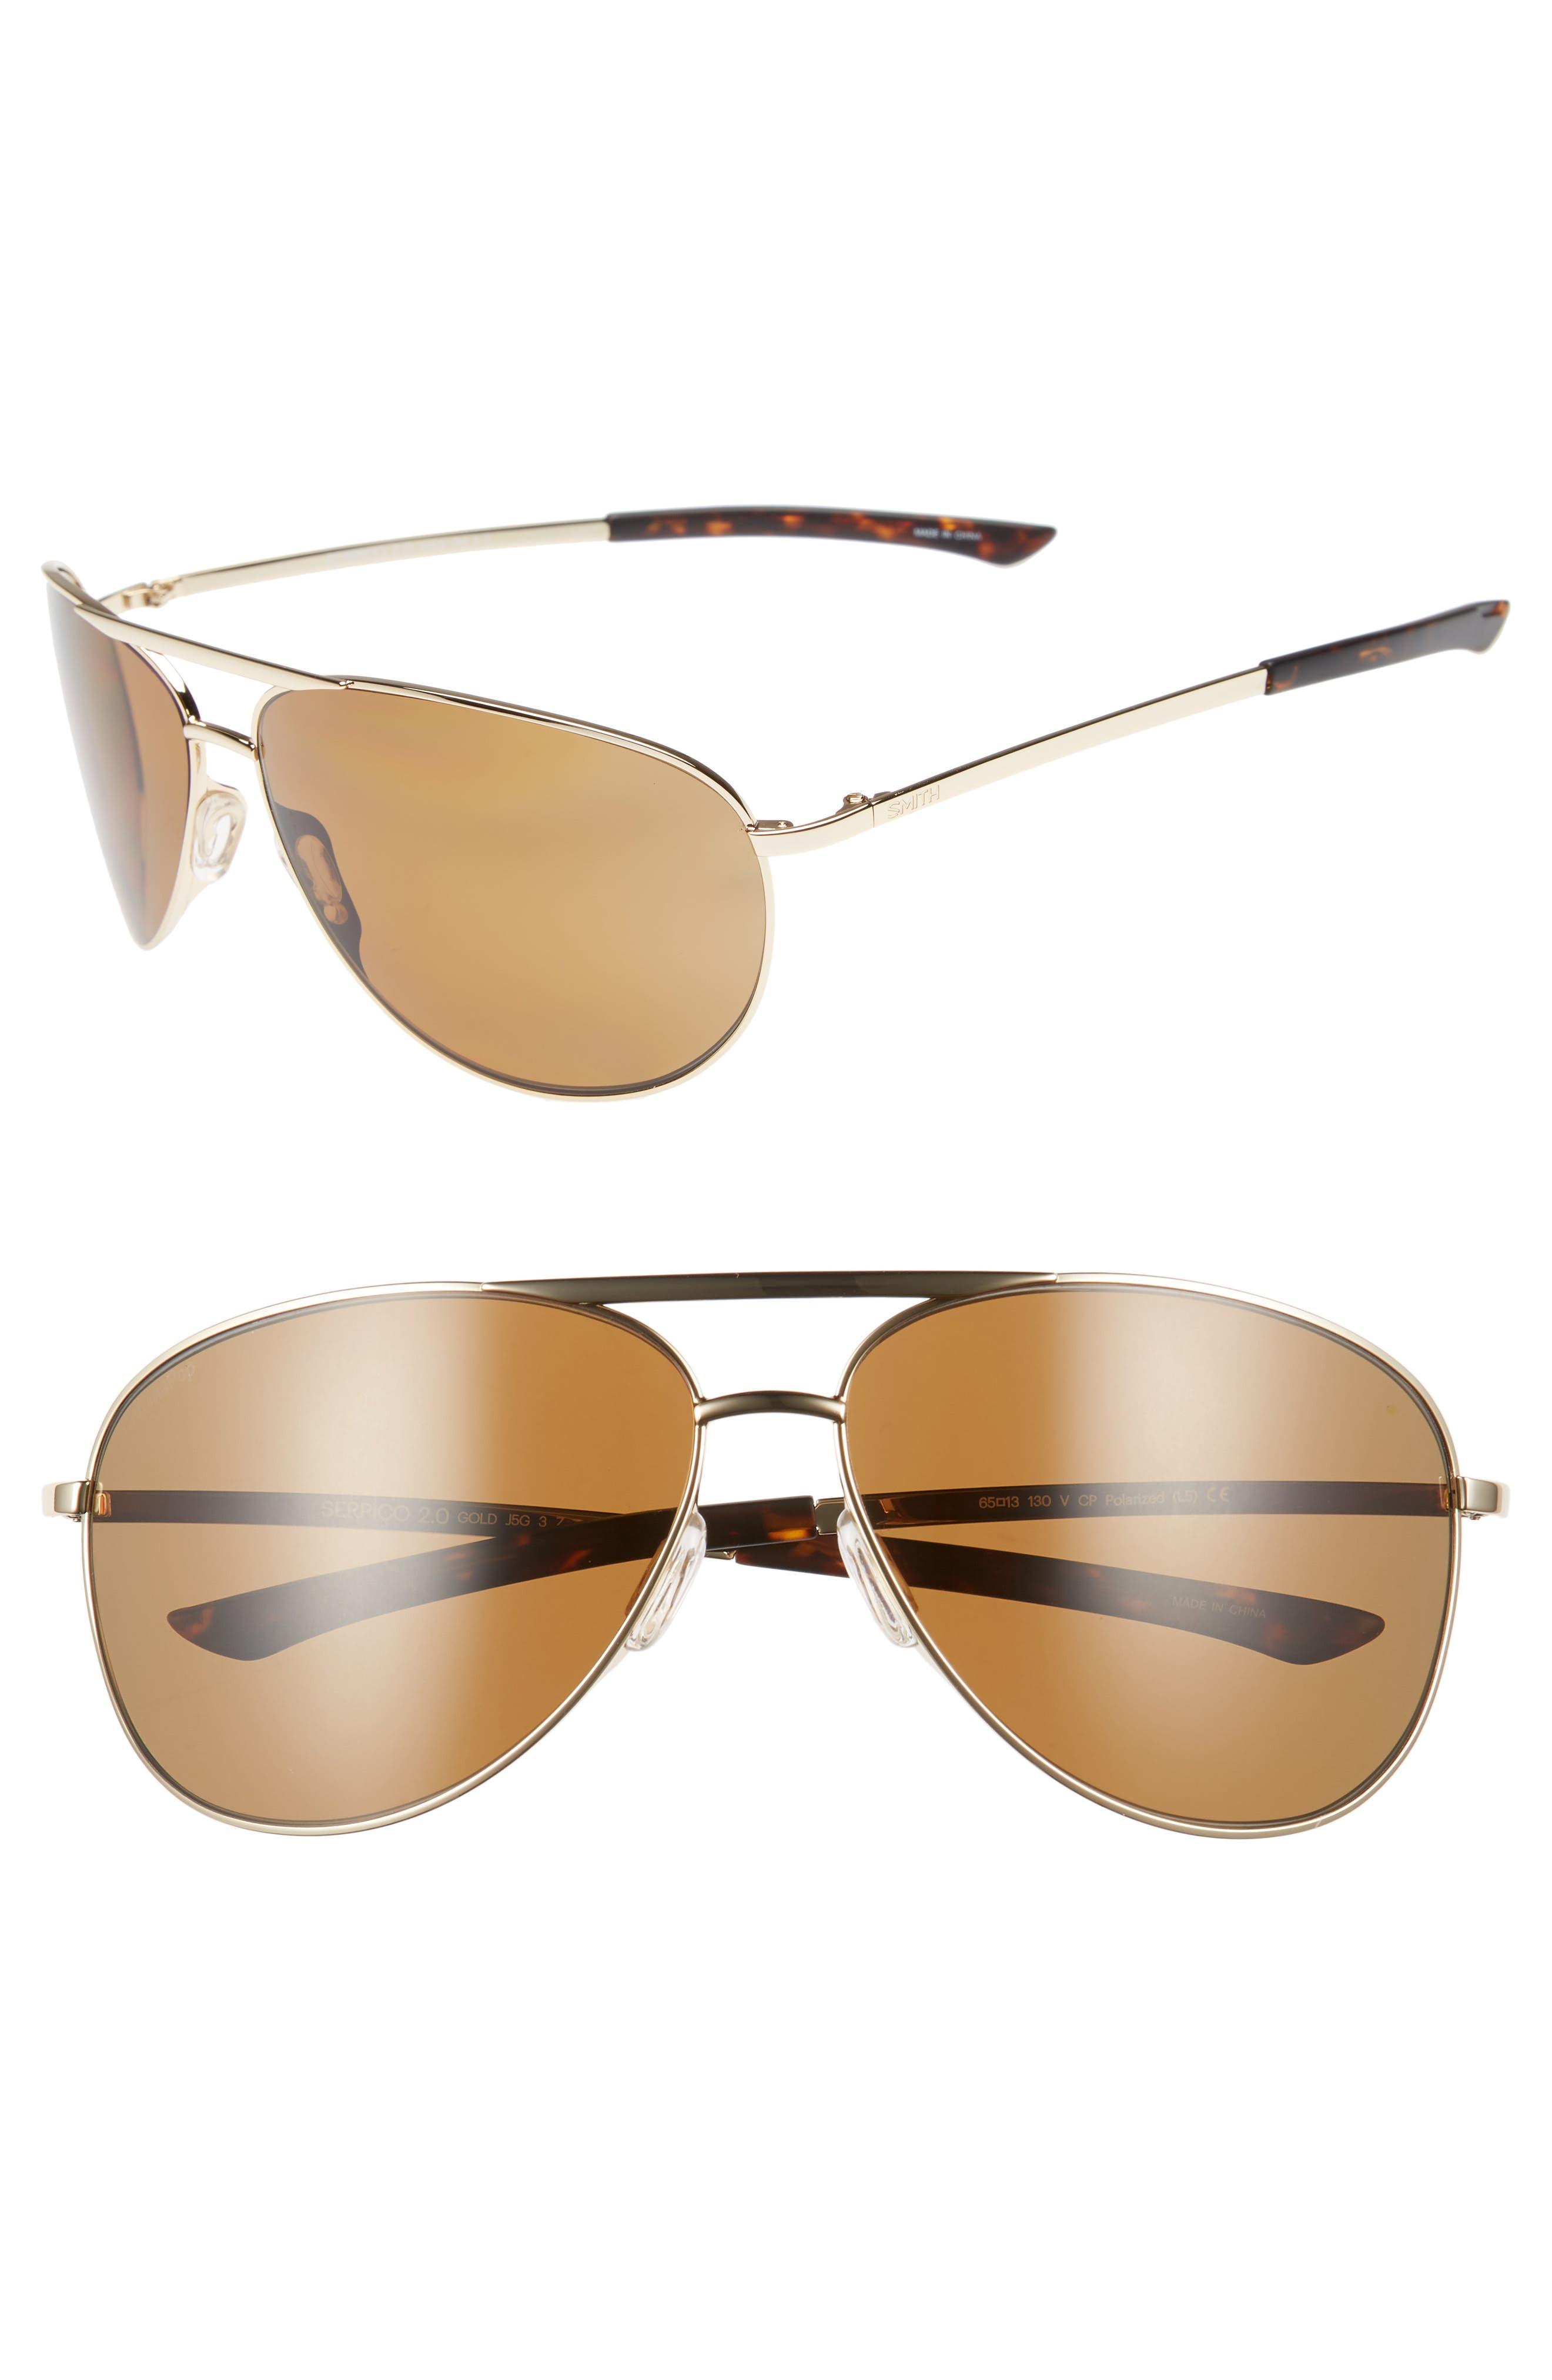 Serpico Slim 2.0 65mm ChromaPop<sup>™</sup> Polarized Aviator Sunglasses,                         Main,                         color, GOLD/ BROWN POLAR